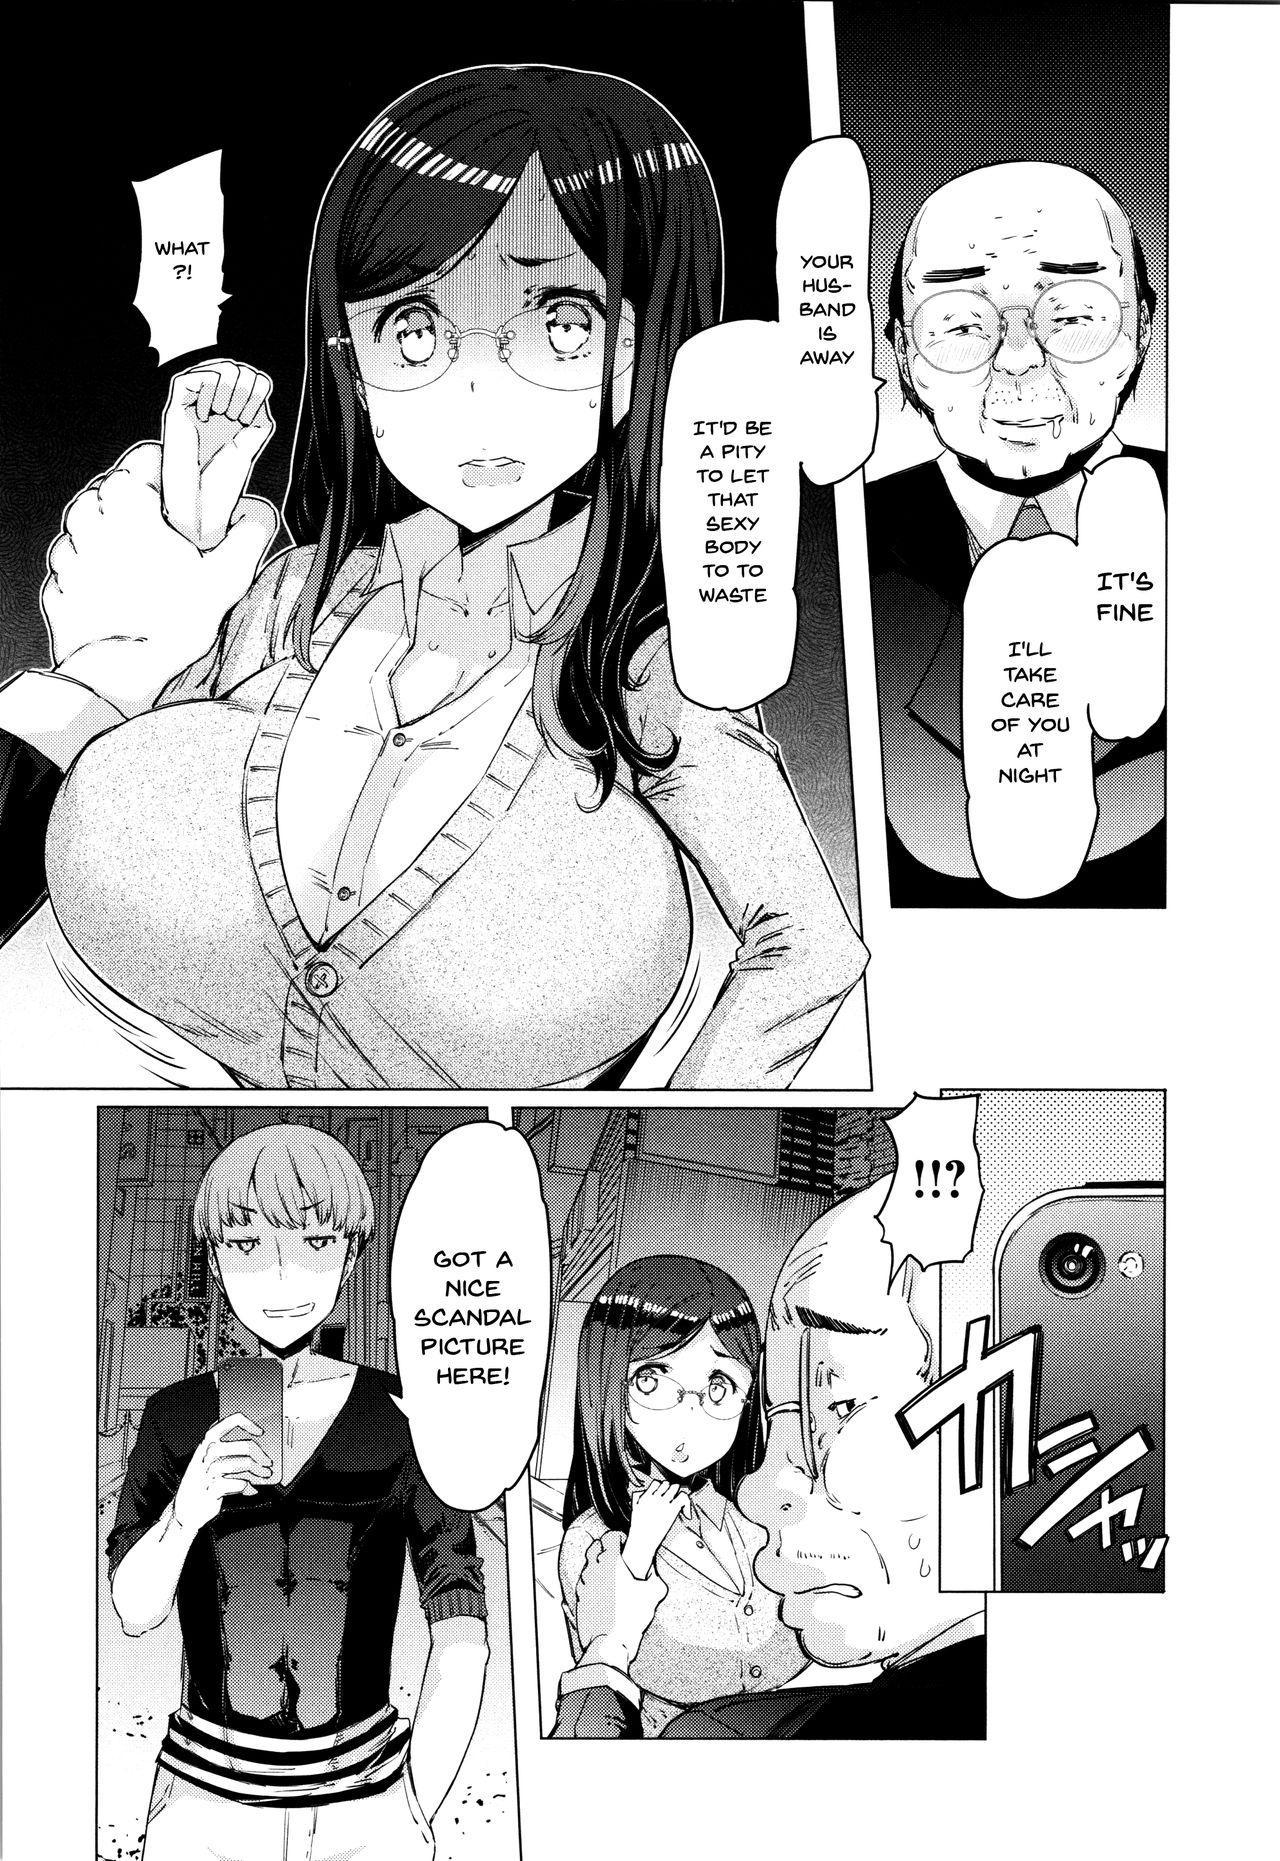 Hitozuma ga Ero Sugite Shigoto ni Naranai! | These Housewives Are Too Lewd I Can't Help It! Ch.1-7 45